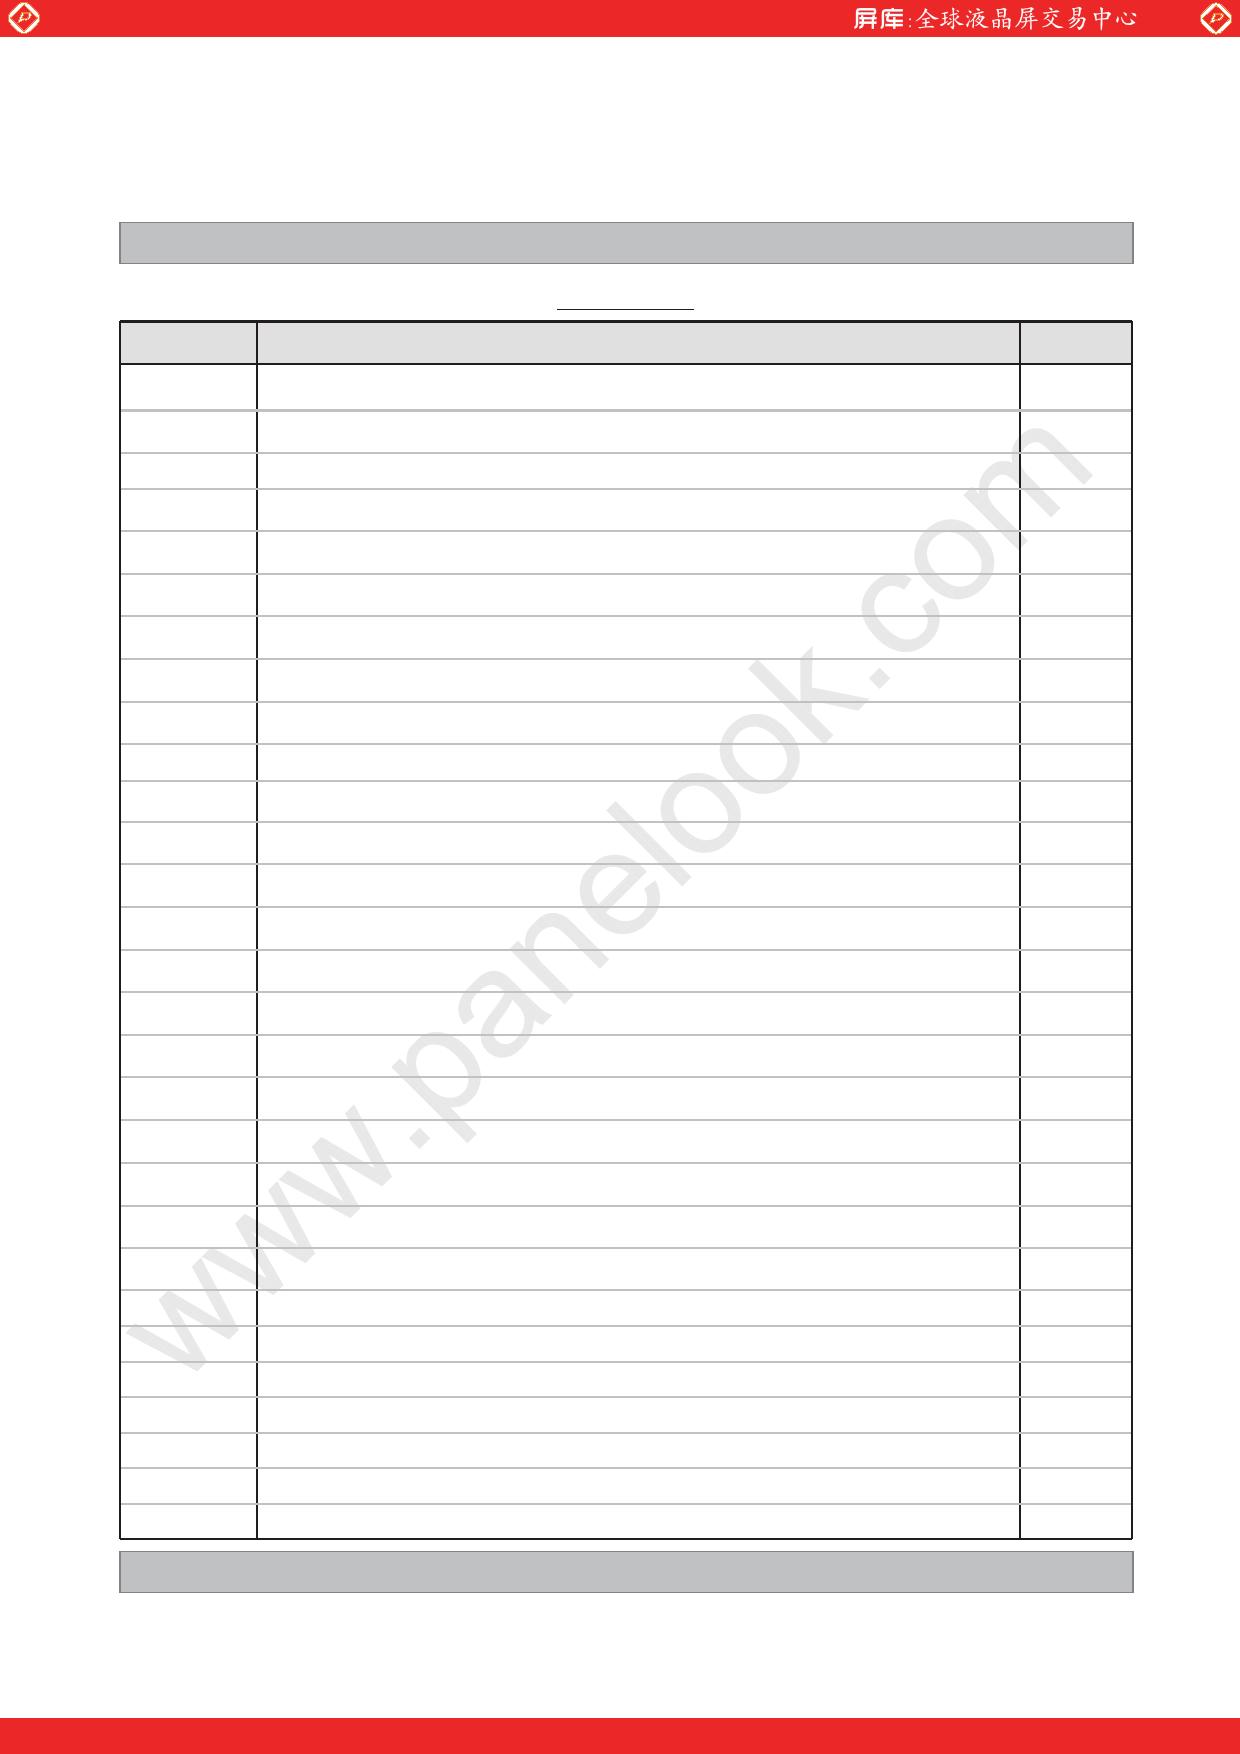 LC320EXN-SEP1 datasheet